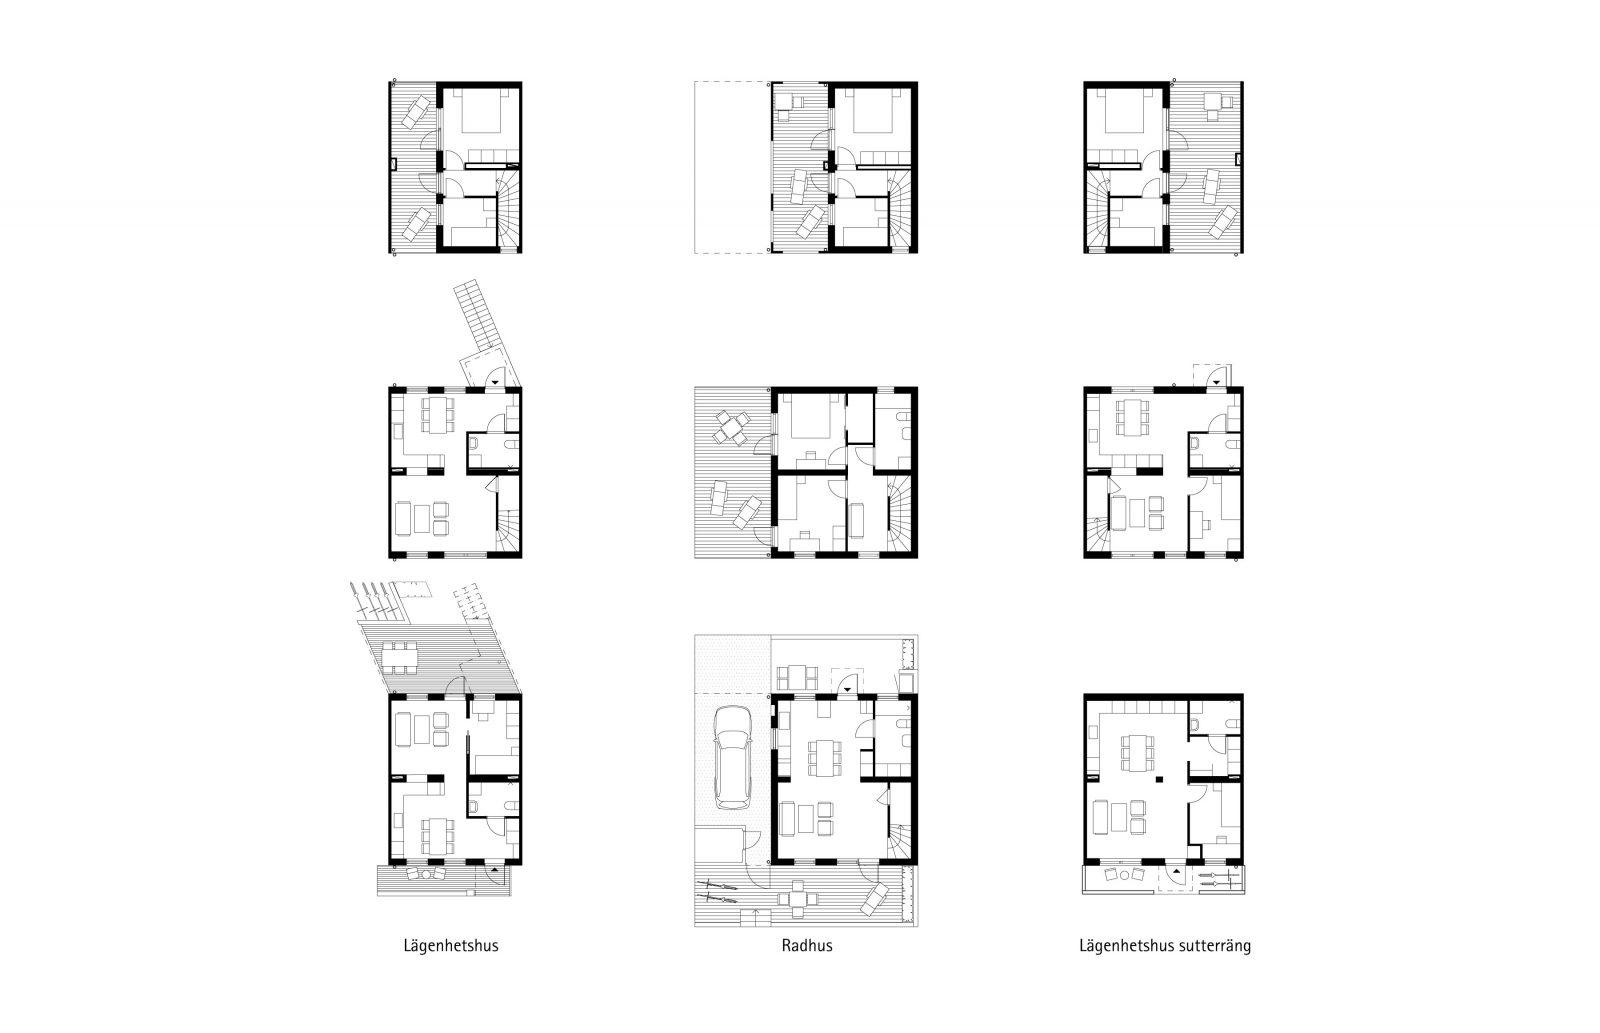 KjellanderSjoberg Fittja Terrace plans